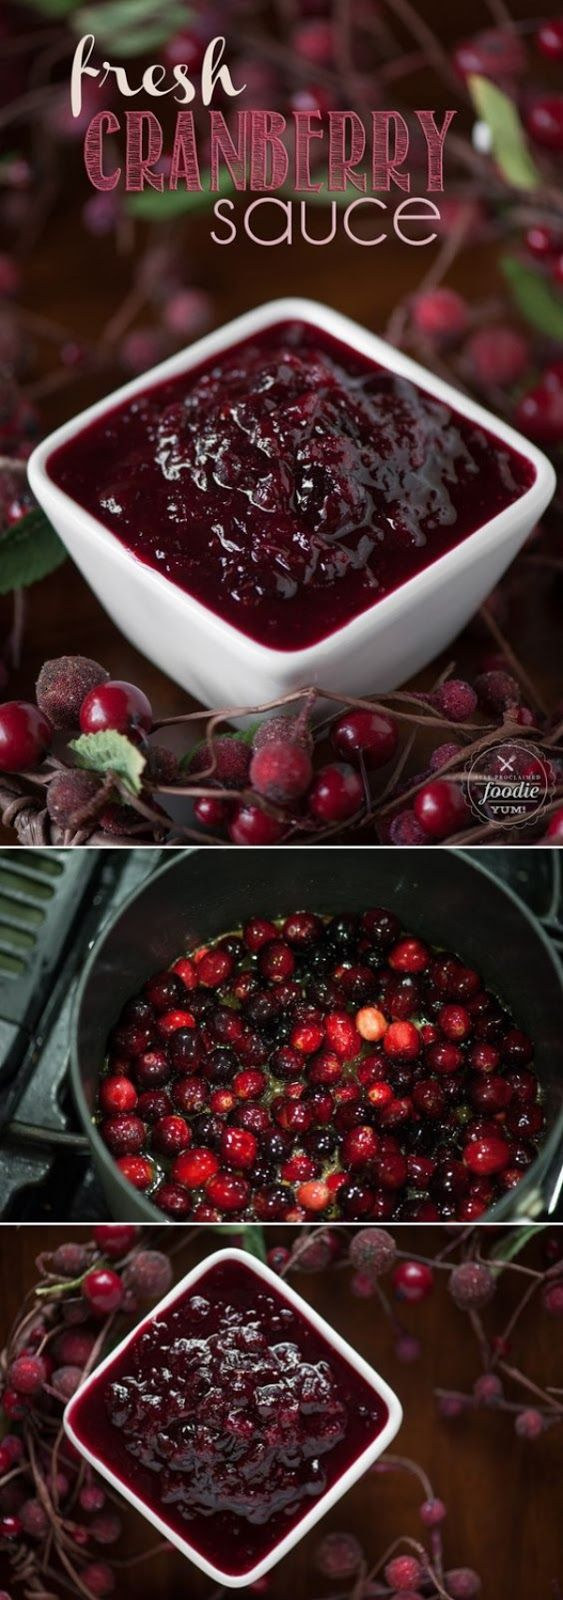 Fresh Cranberry Sauce #cranberrysauce